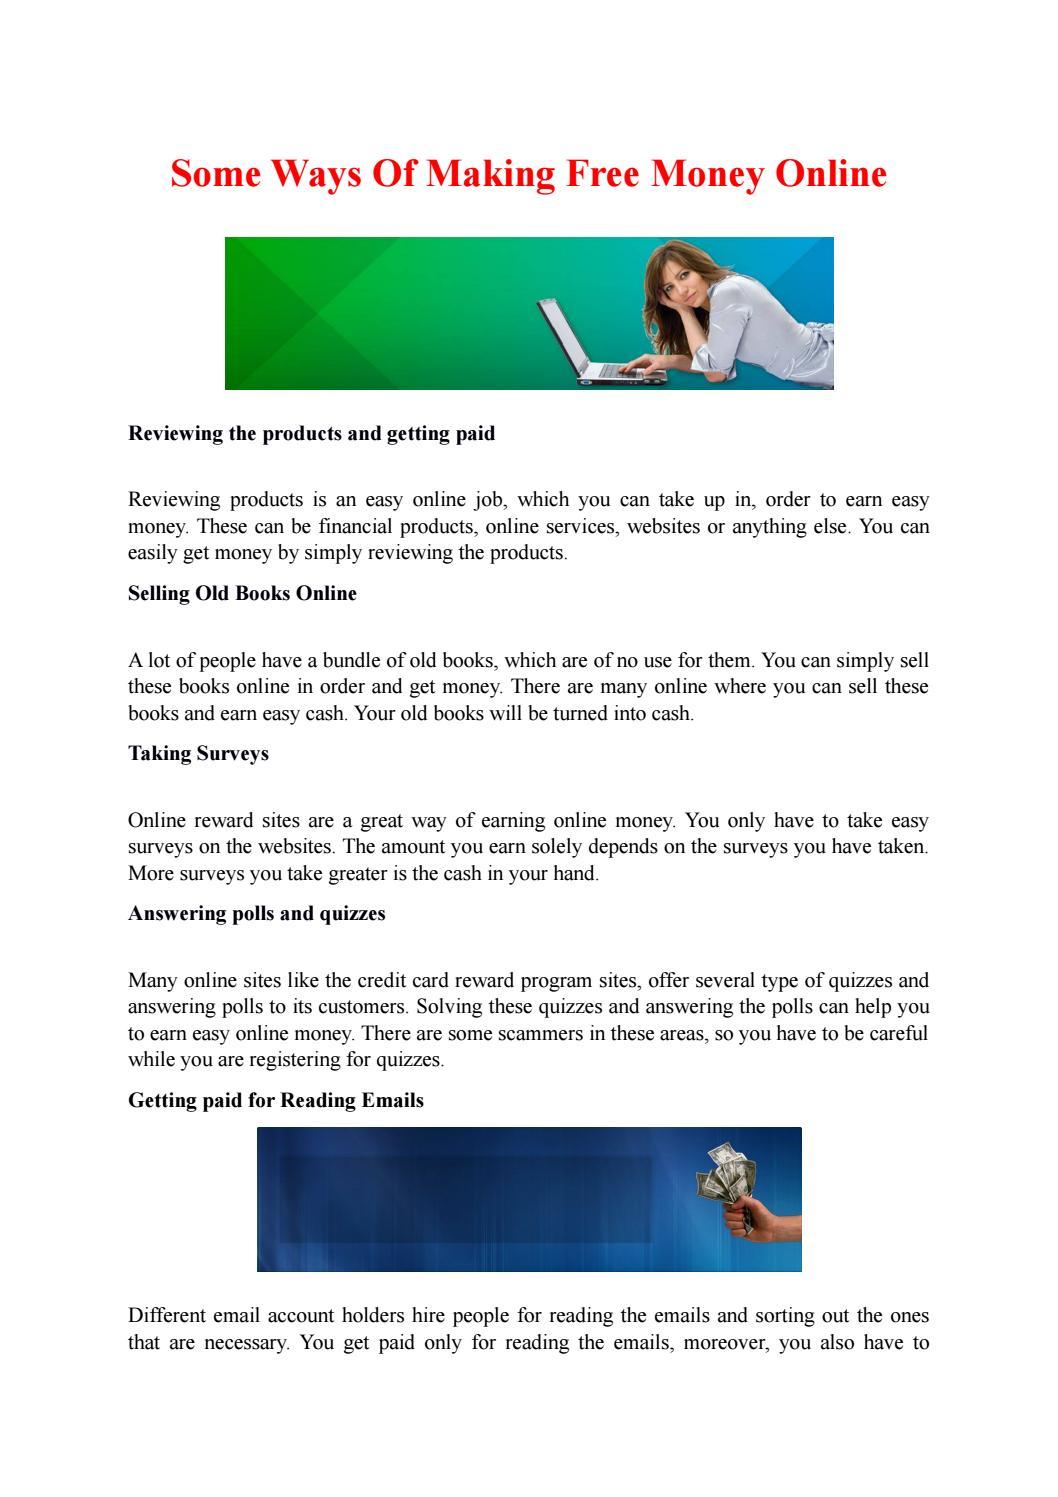 Some Ways Of Making Free Money Online by ClixSense - issuu